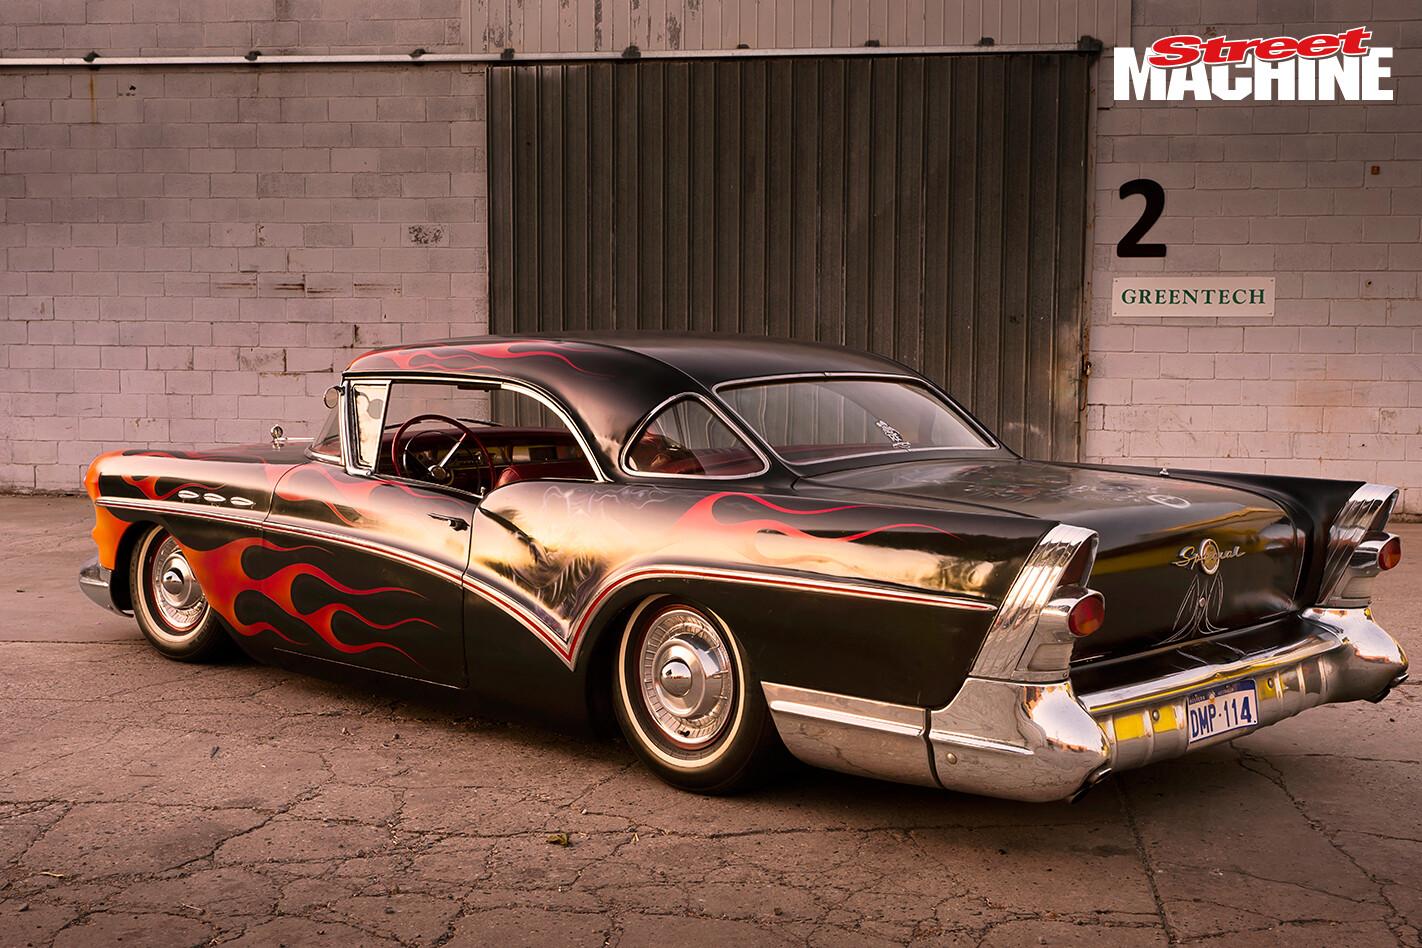 57 Buick Special Custom 2